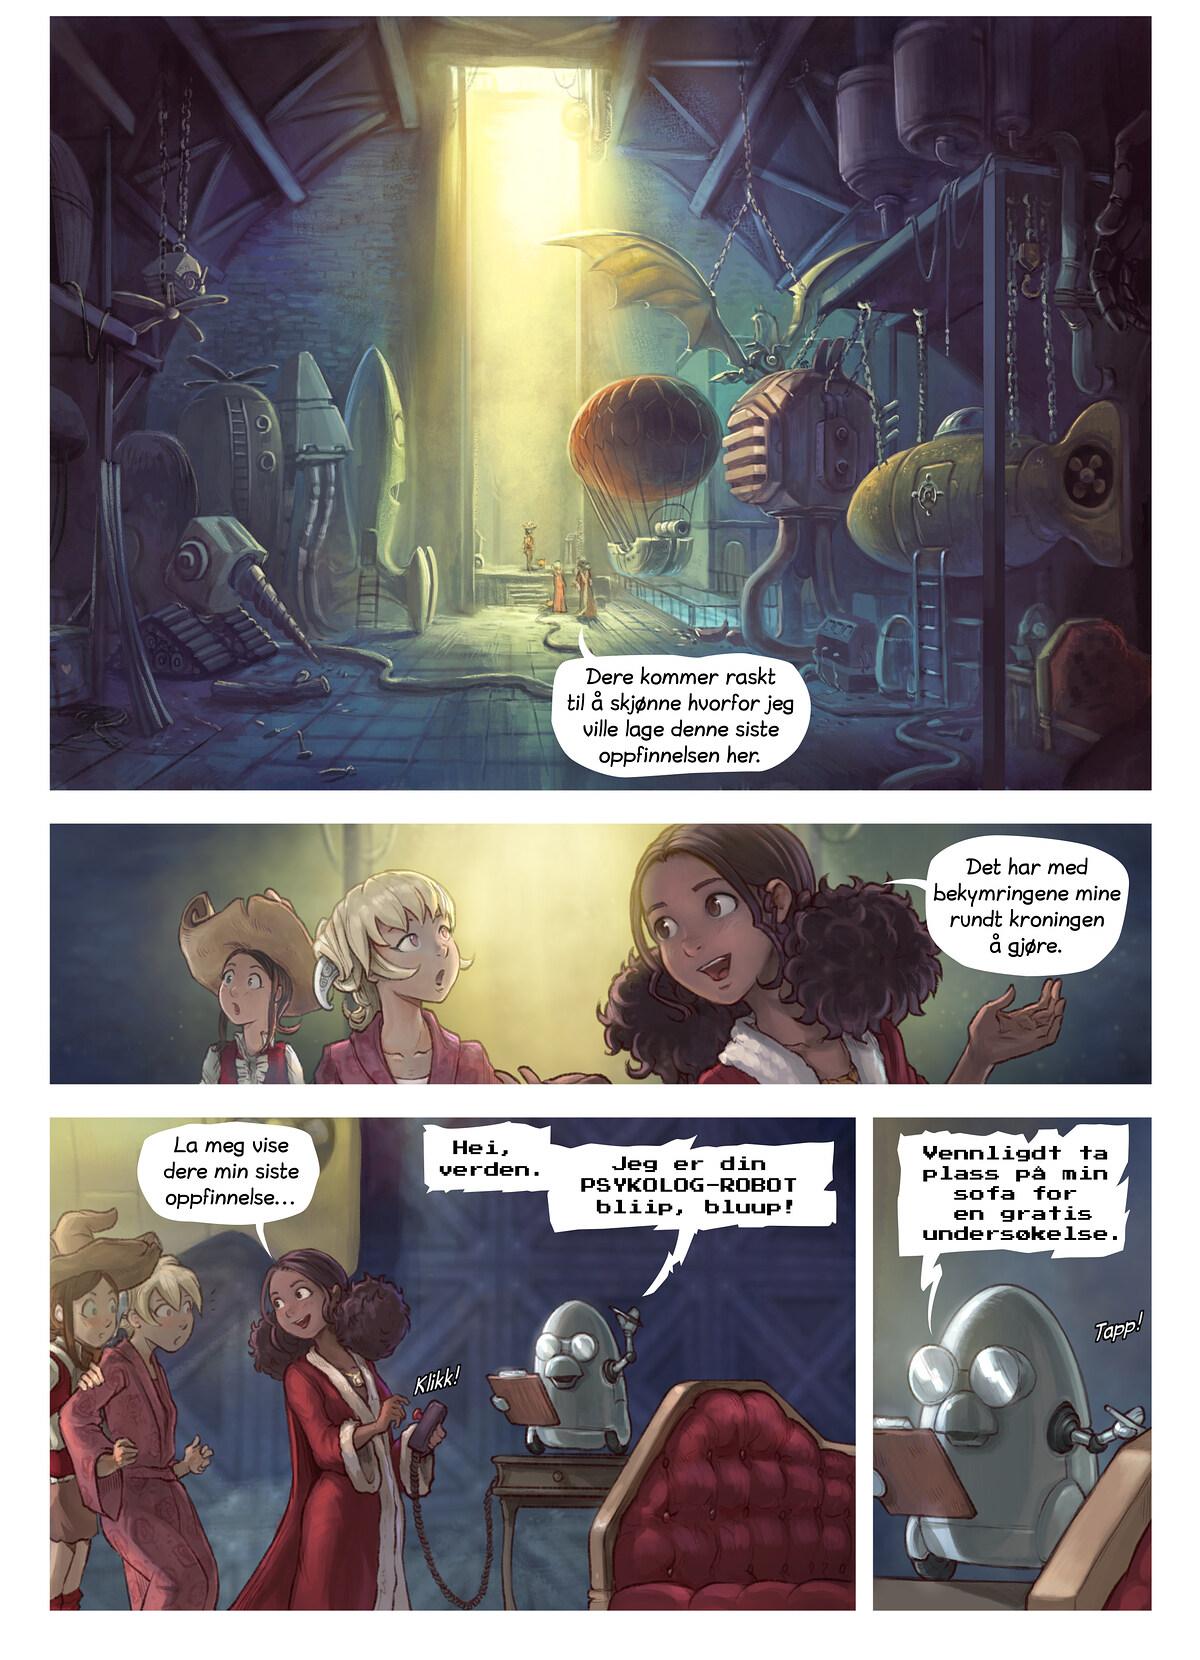 Episode 27: Korianders oppfinnelse, Page 3